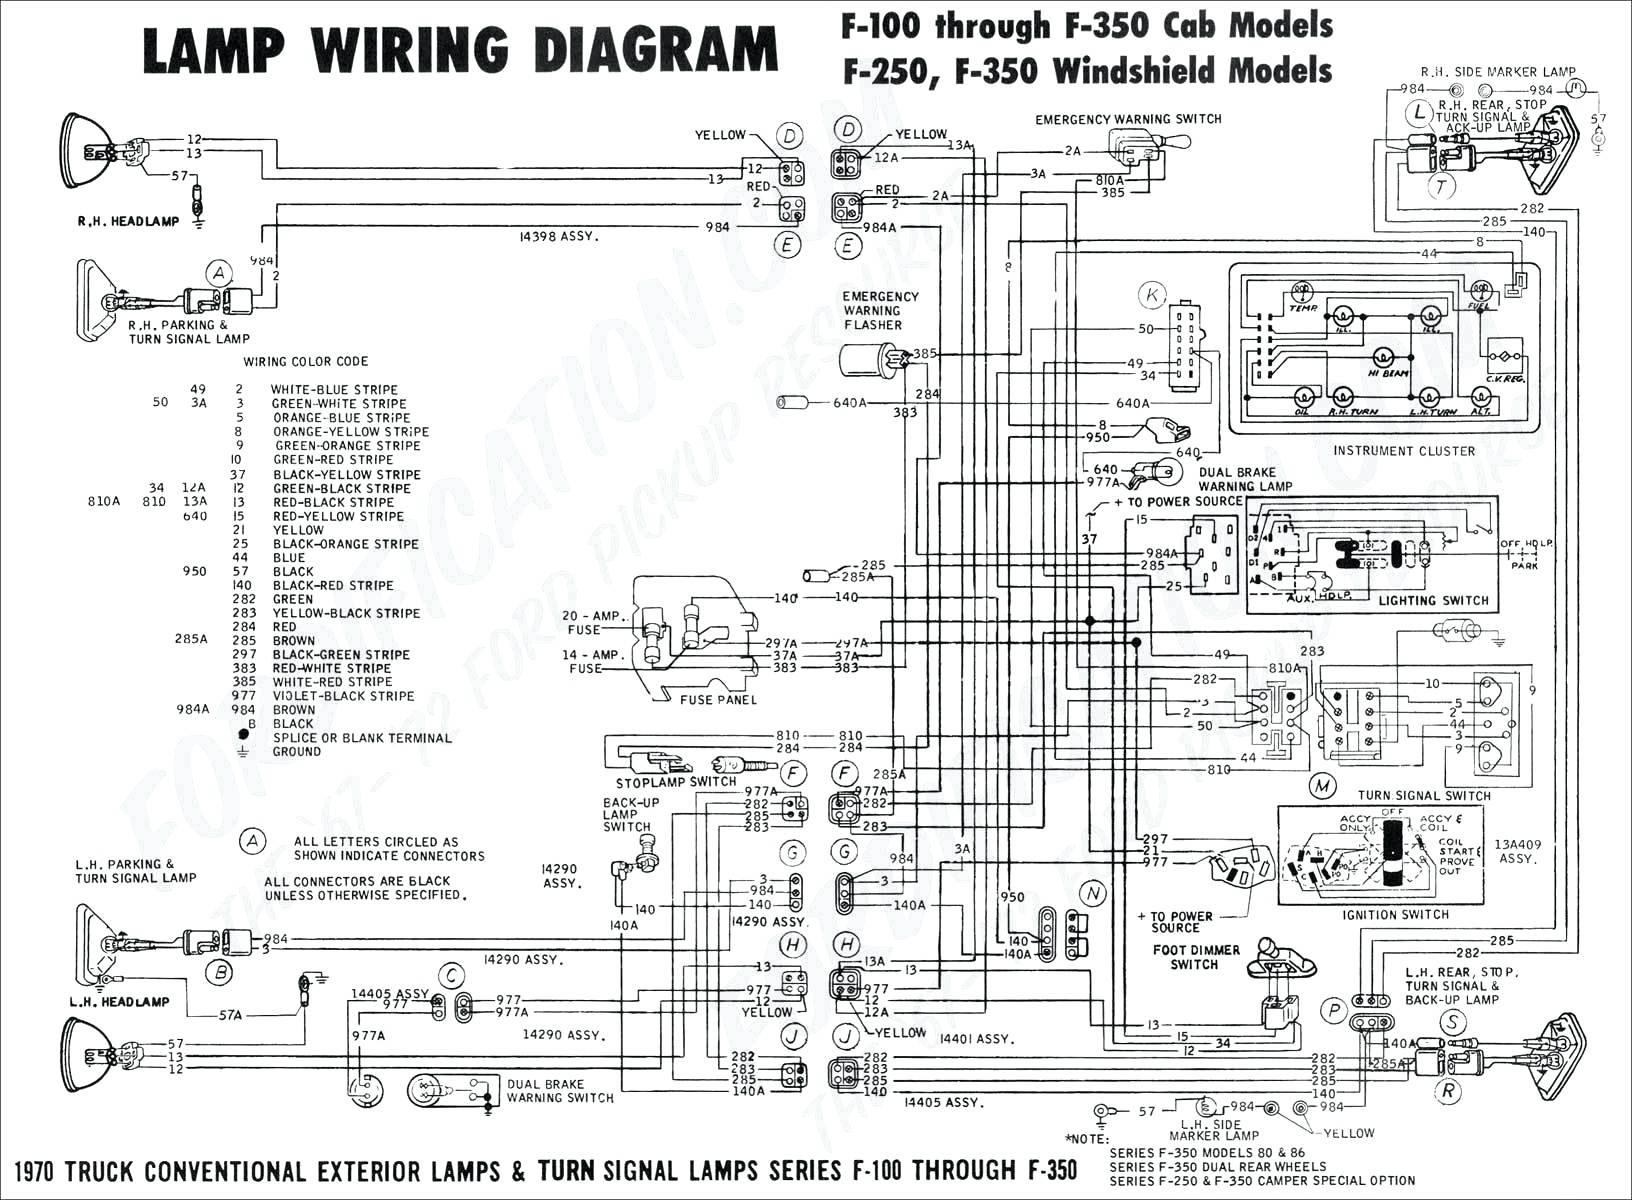 thread 2005 dodge ram wiring diagram wire center u2022 rh insurapro co 2002 Dodge Ram Electrical